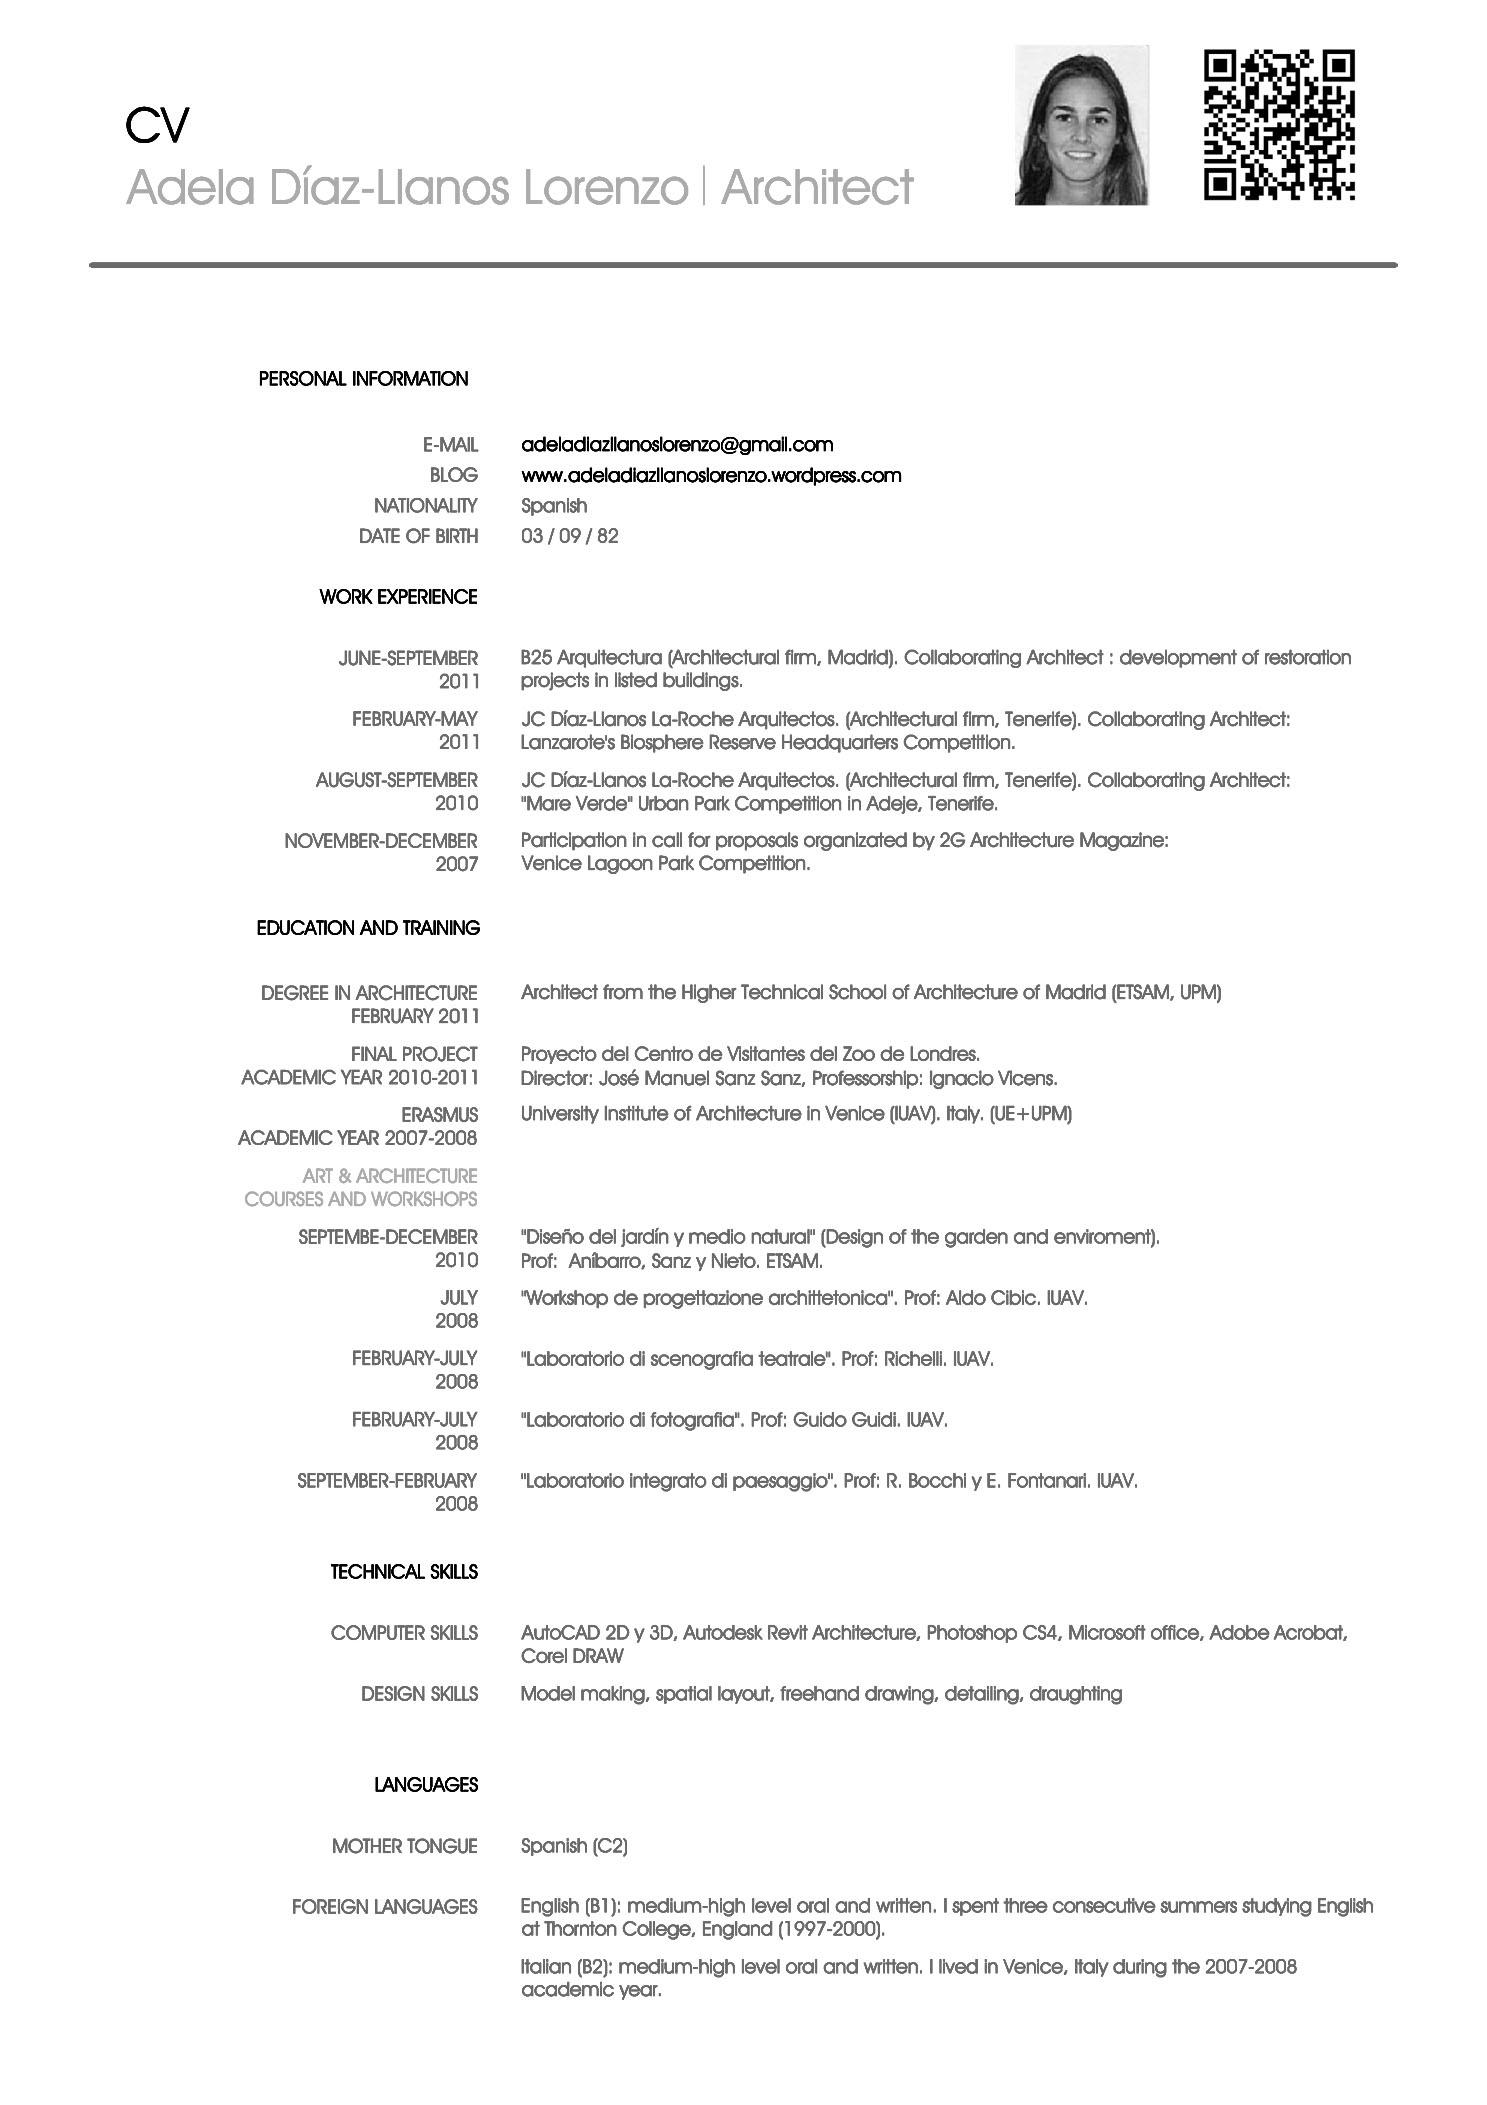 cv examples for teachers sample customer service resume cv examples for teachers teacher resume sample monster pin curriculum vitae samples nursing english teacher cv